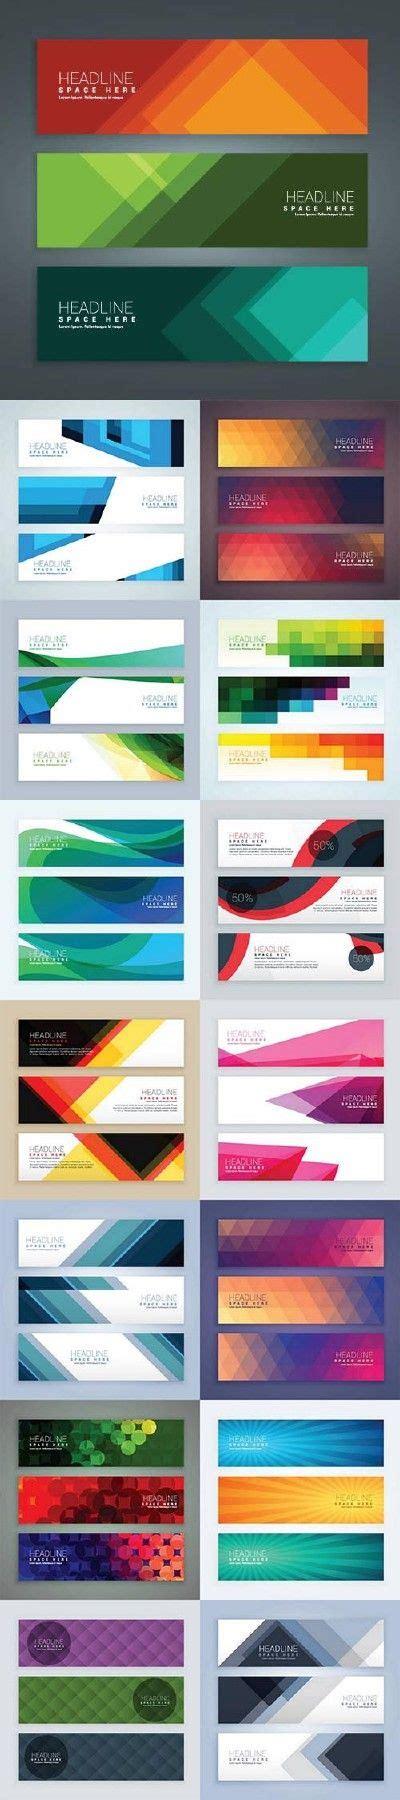 layout banner web 17 best images about design inspiration on pinterest